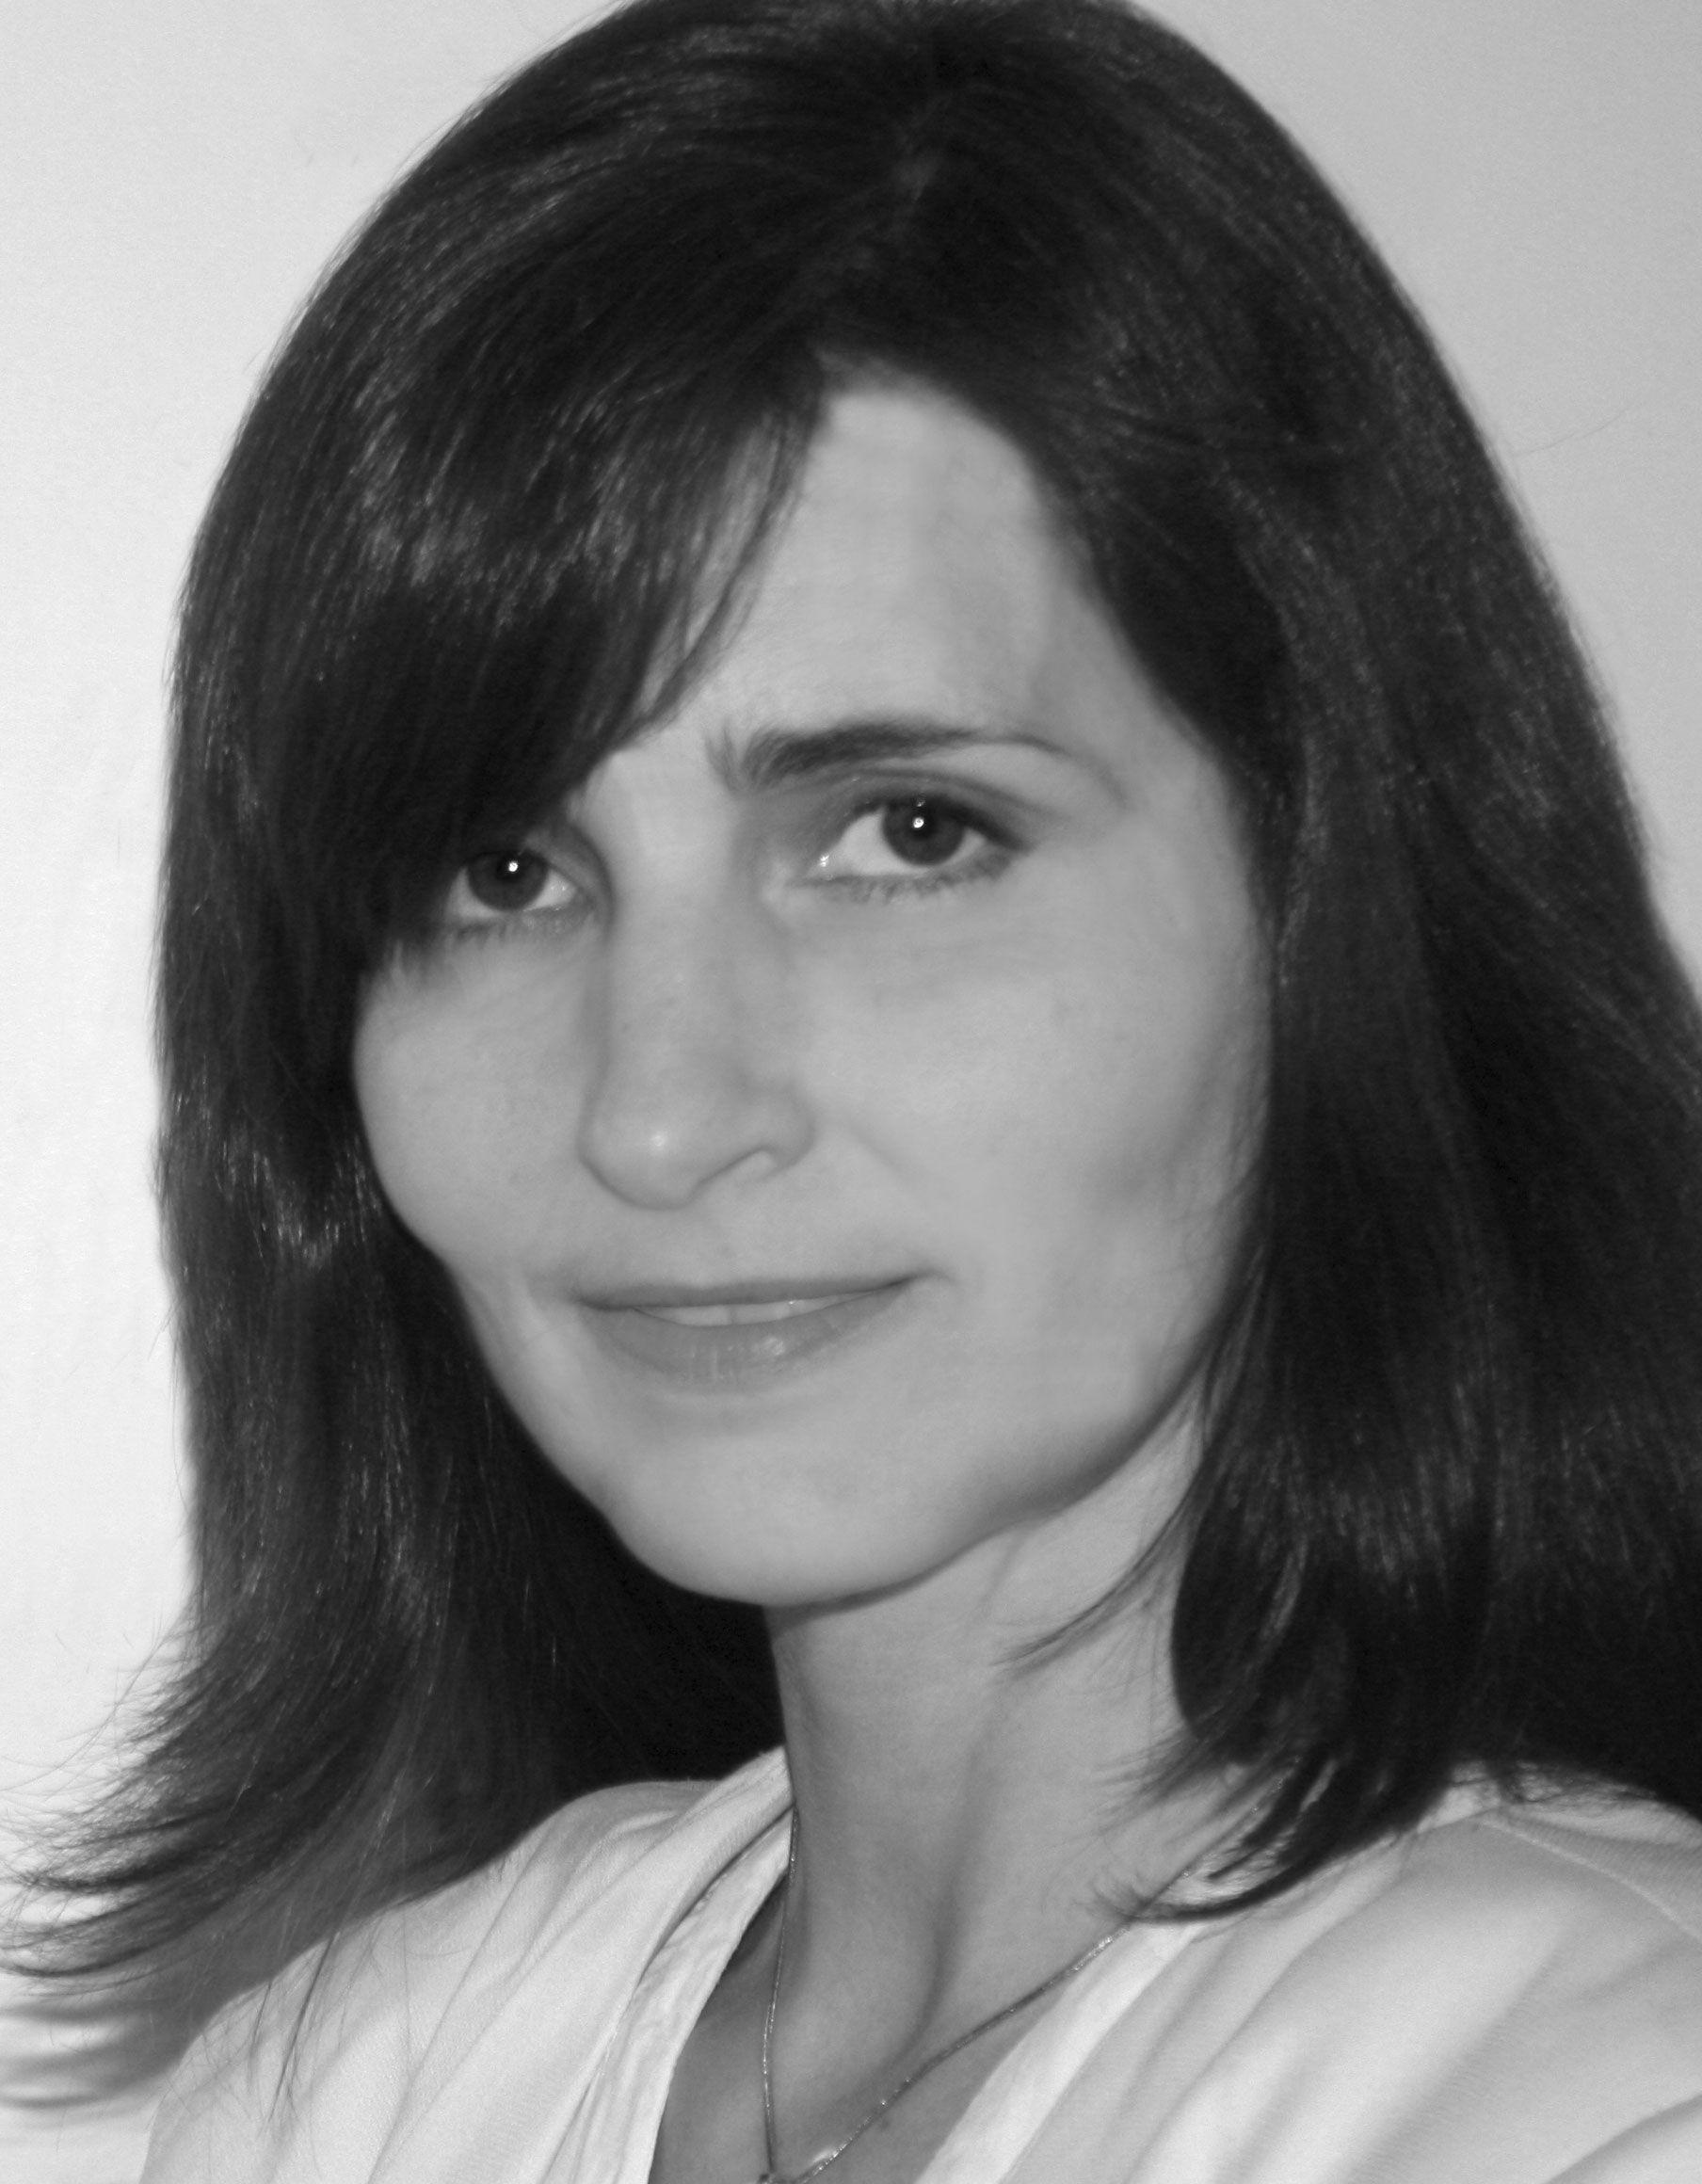 Daniela Küntzer